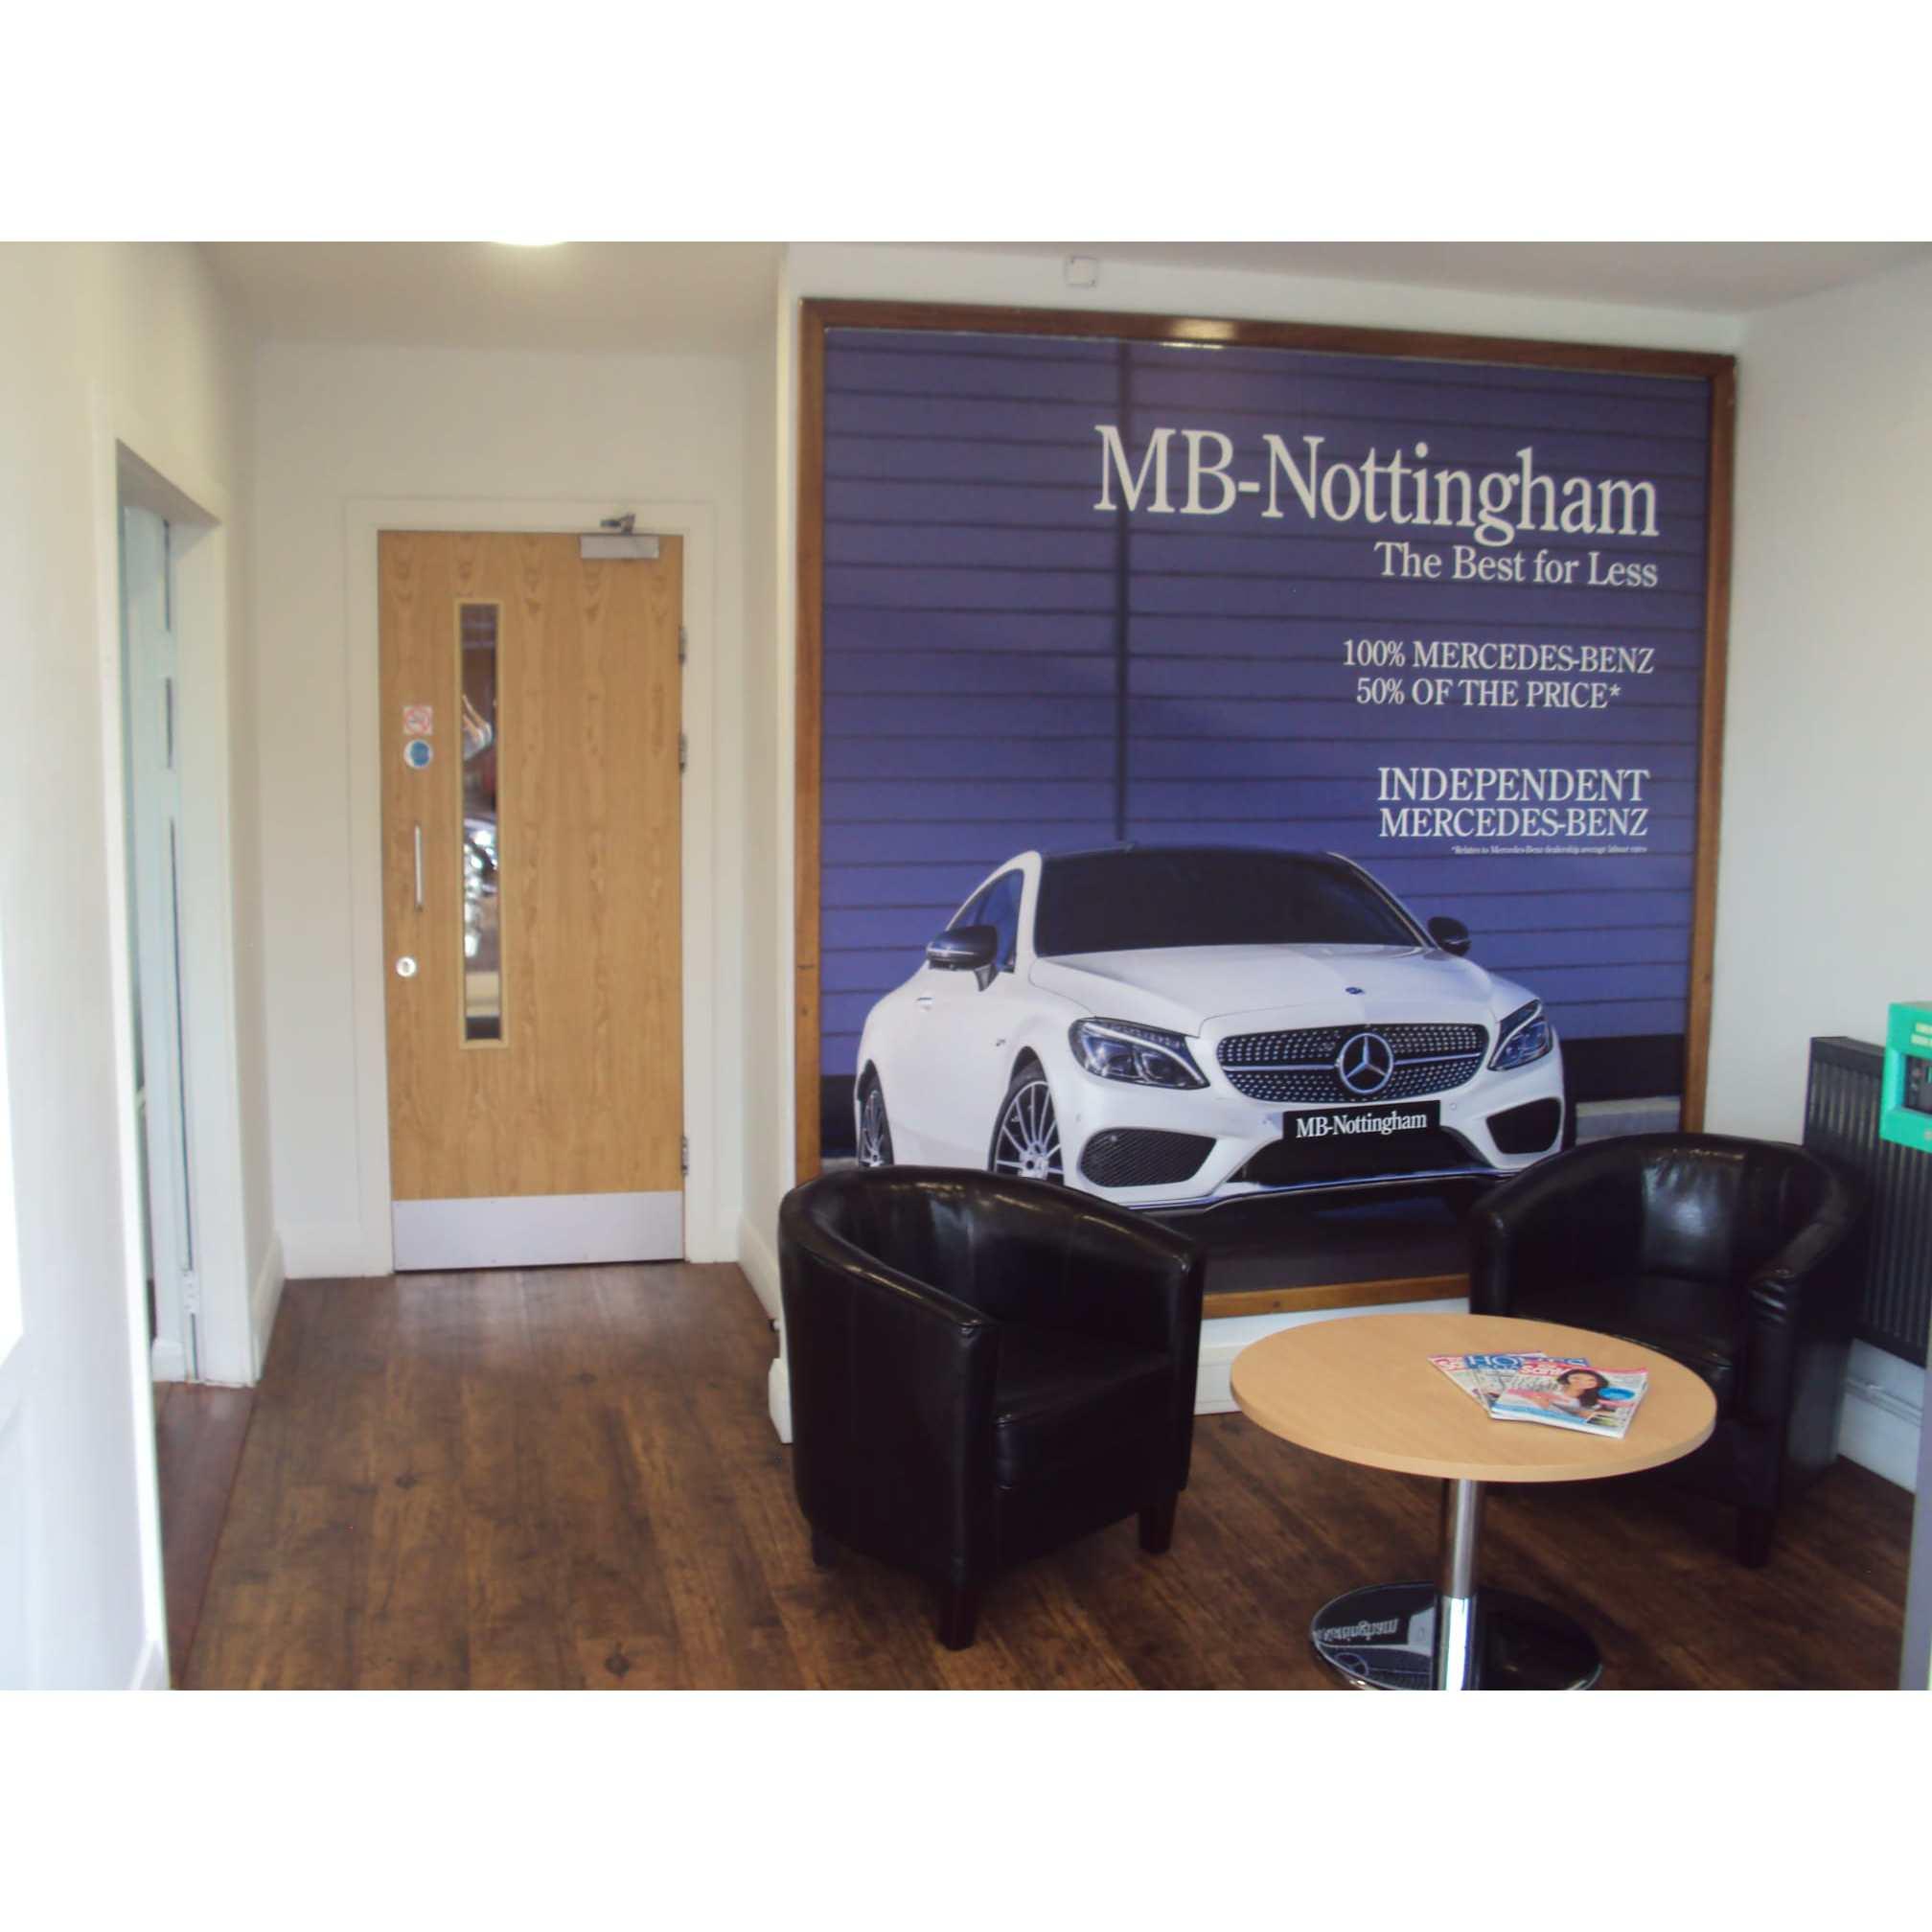 Independent Mercedes-Benz Nottingham | MB Nottingham